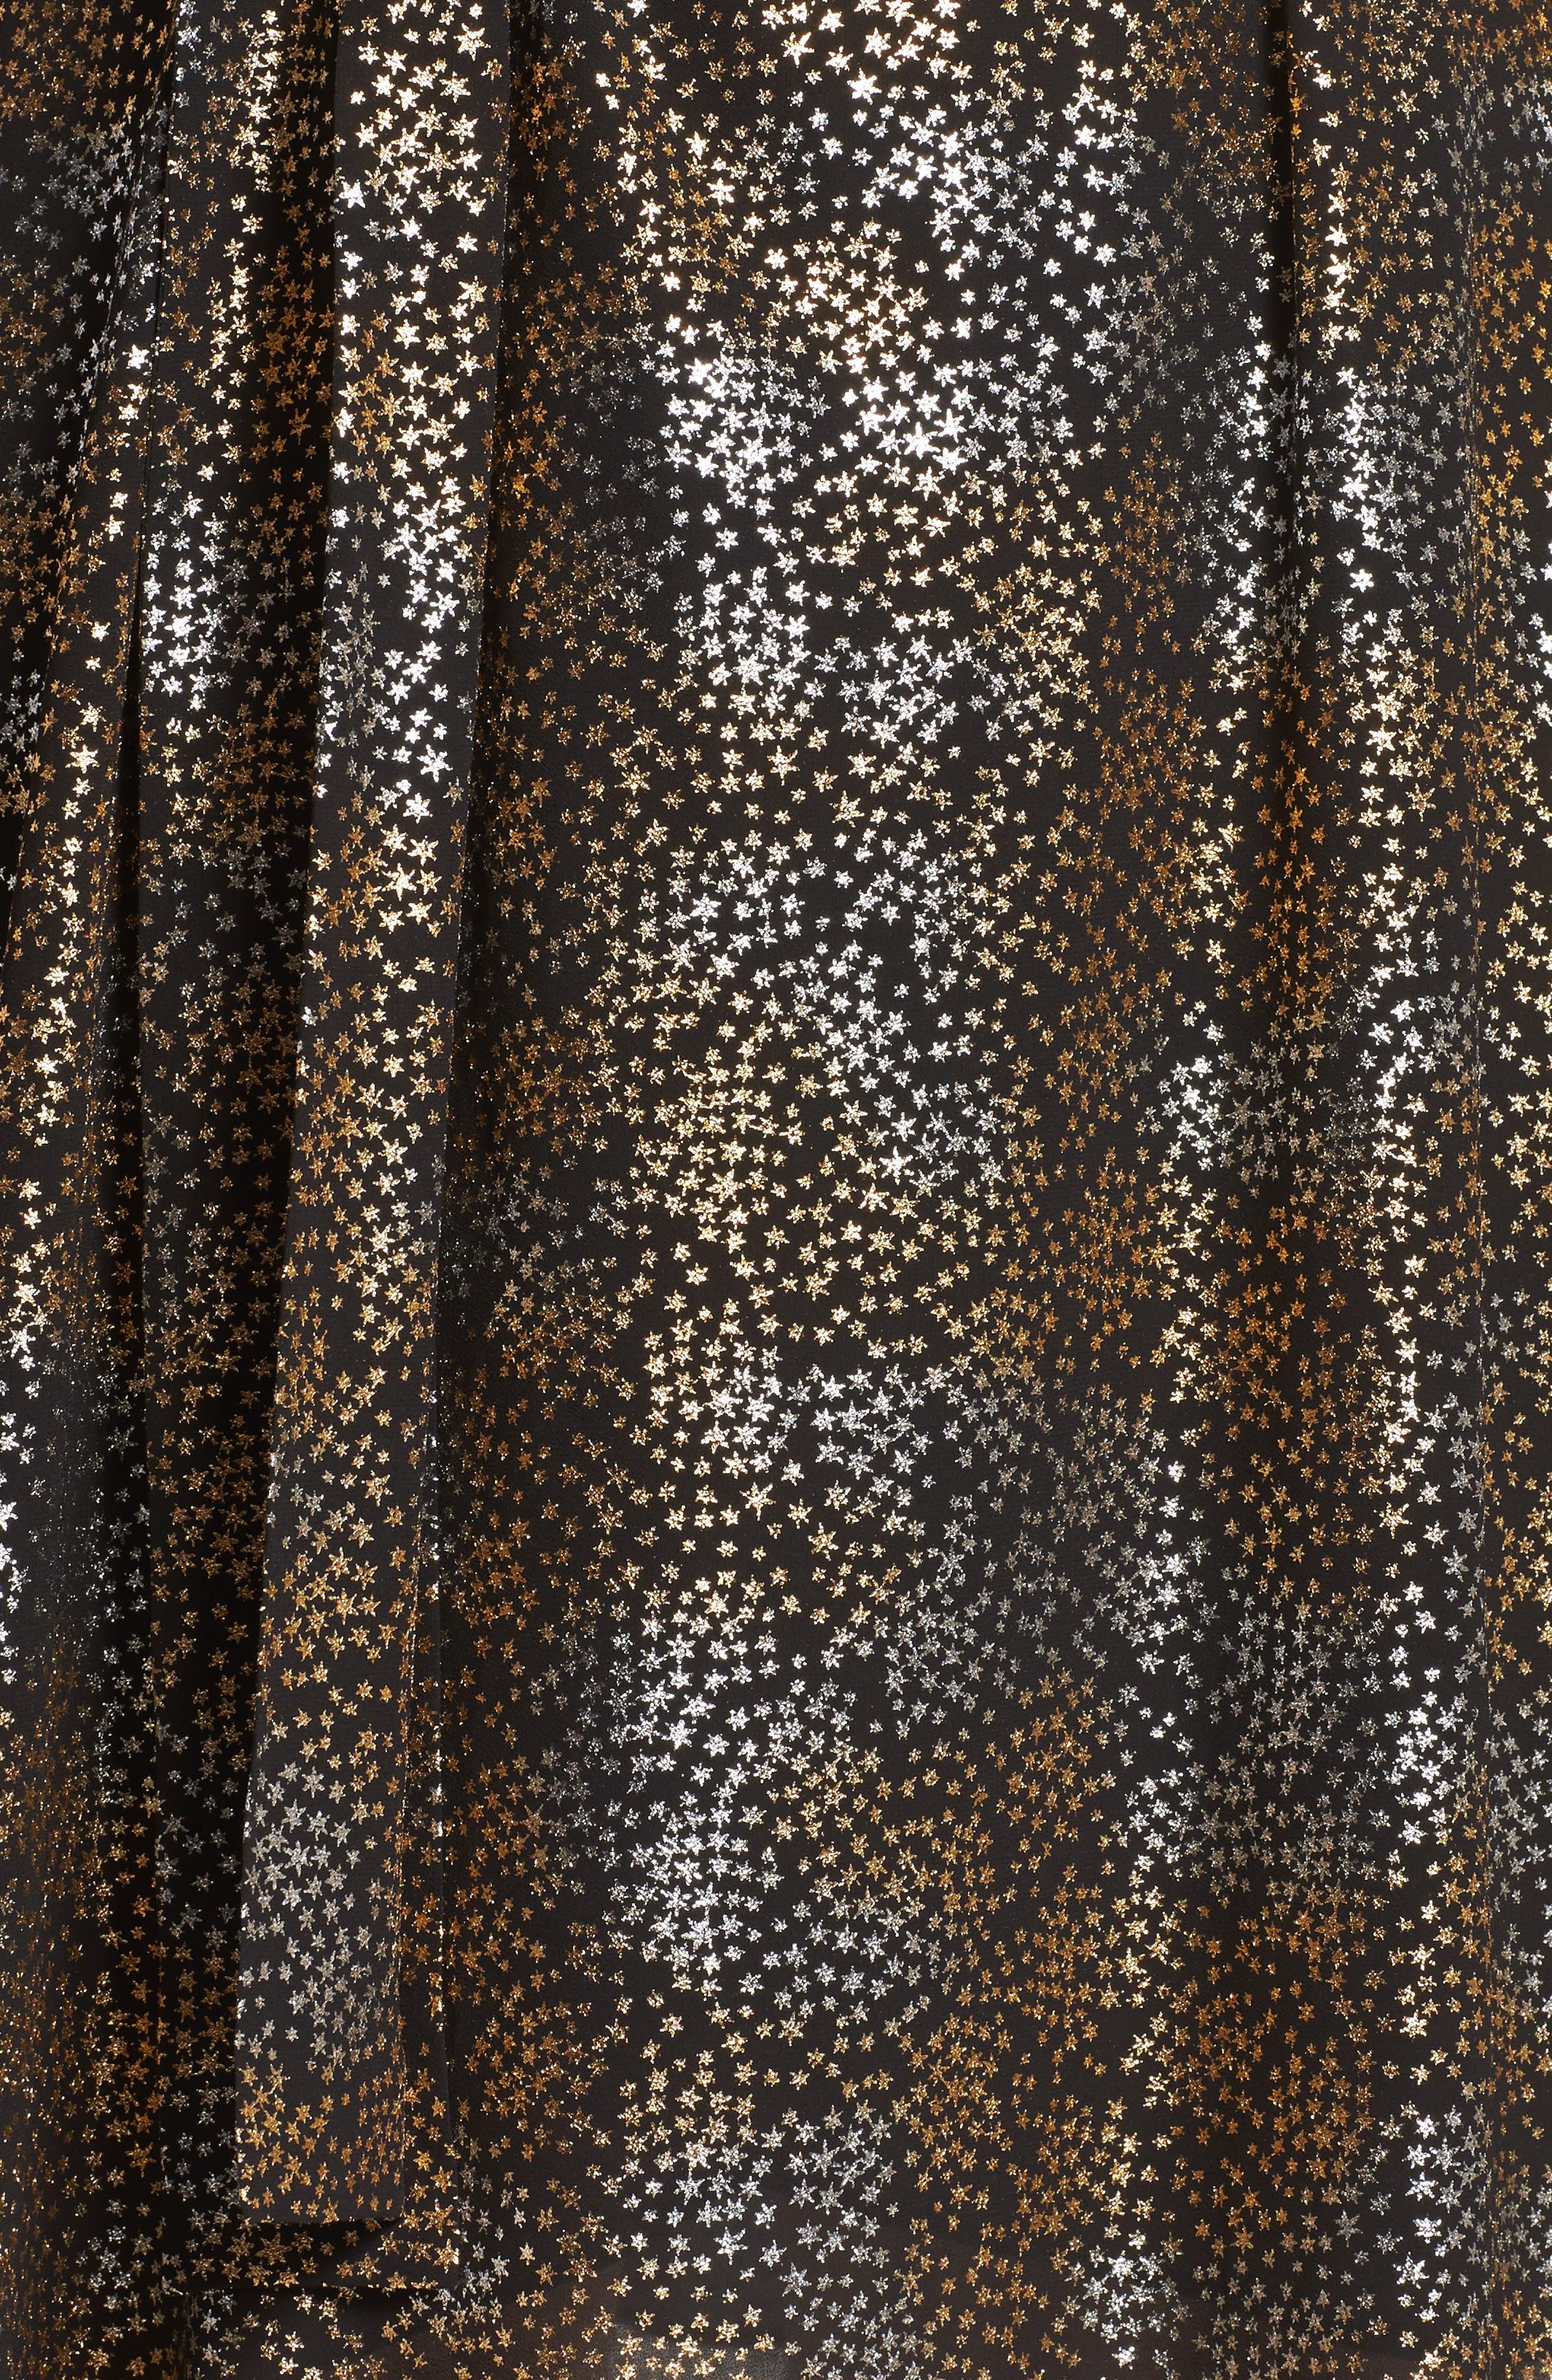 Cold Shoulder Metallic Star A-Line Dress,                             Alternate thumbnail 5, color,                             047